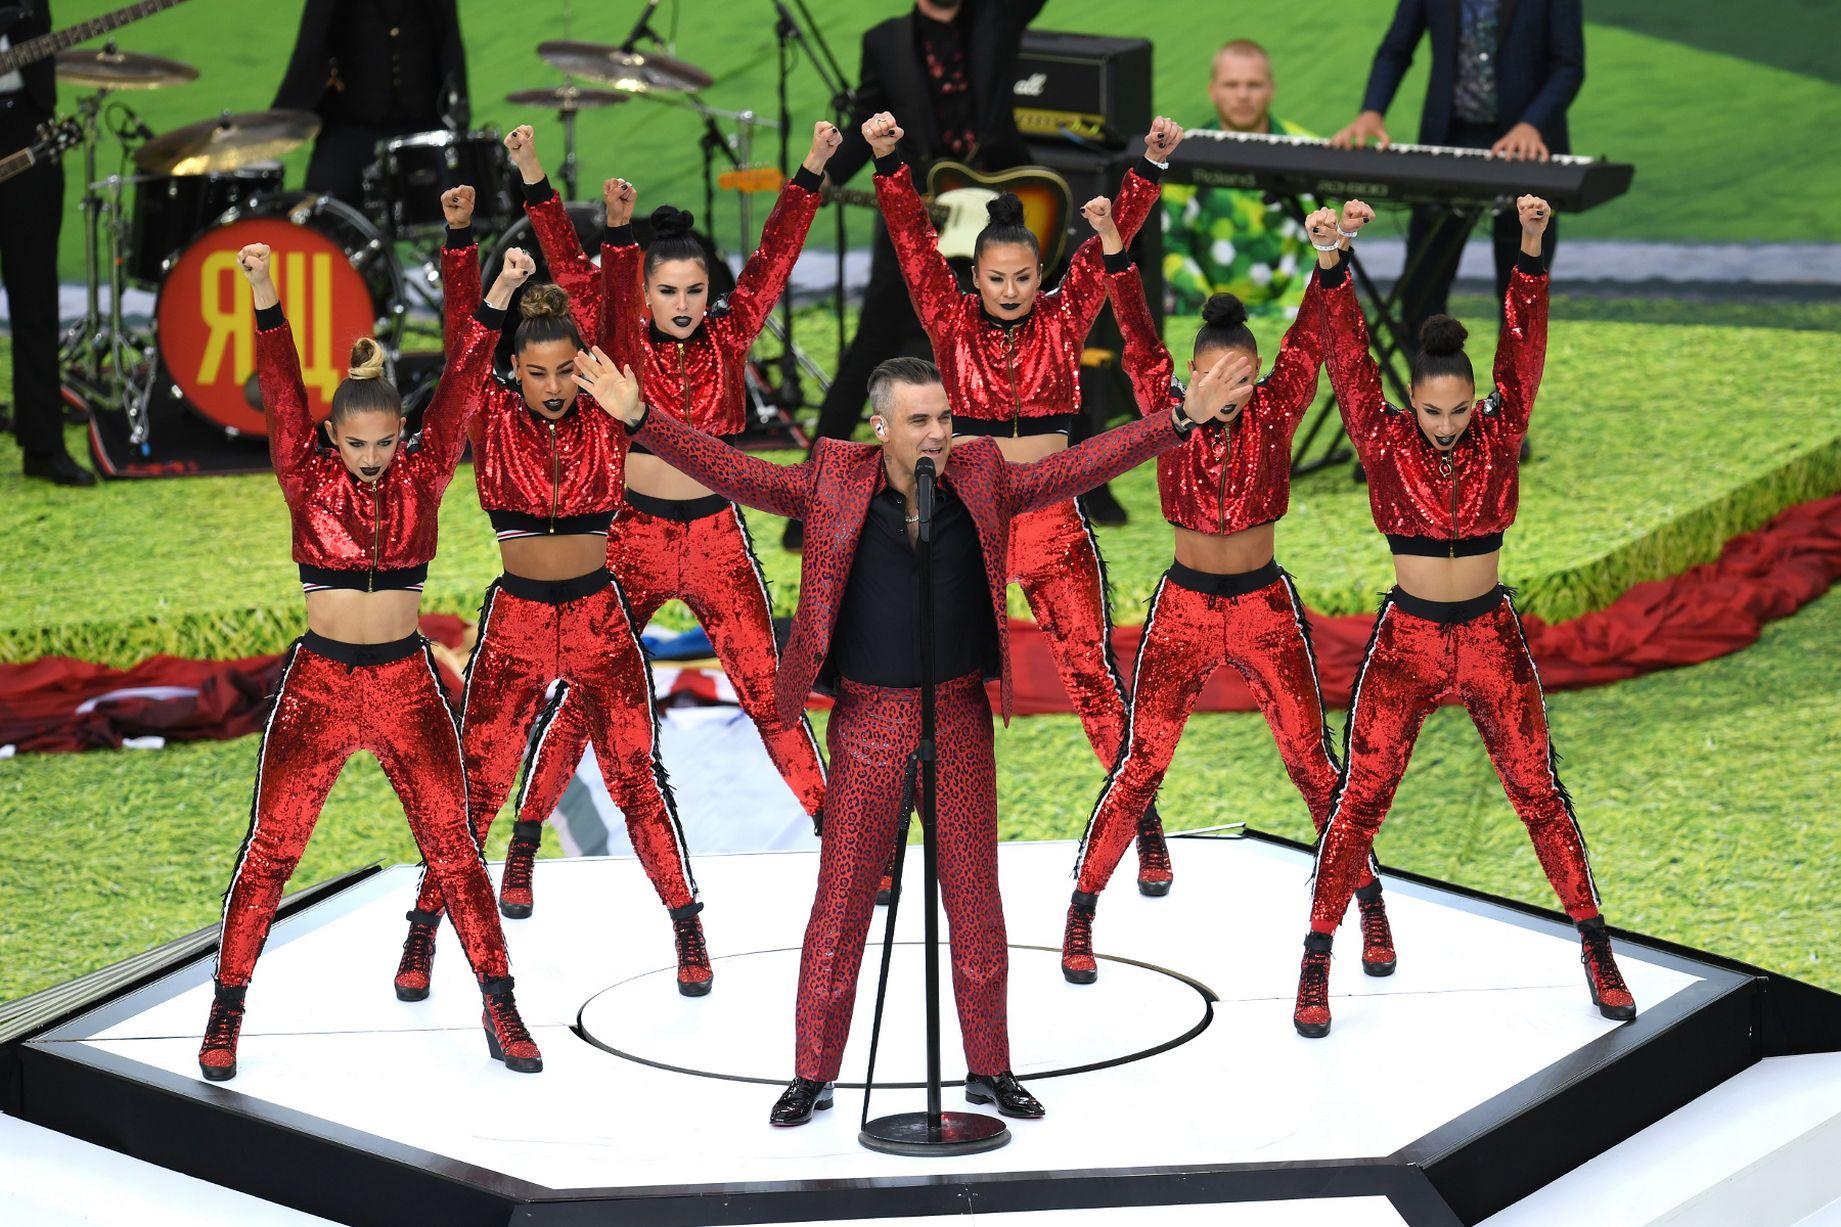 Robbie Williams cantando - 1841x1227